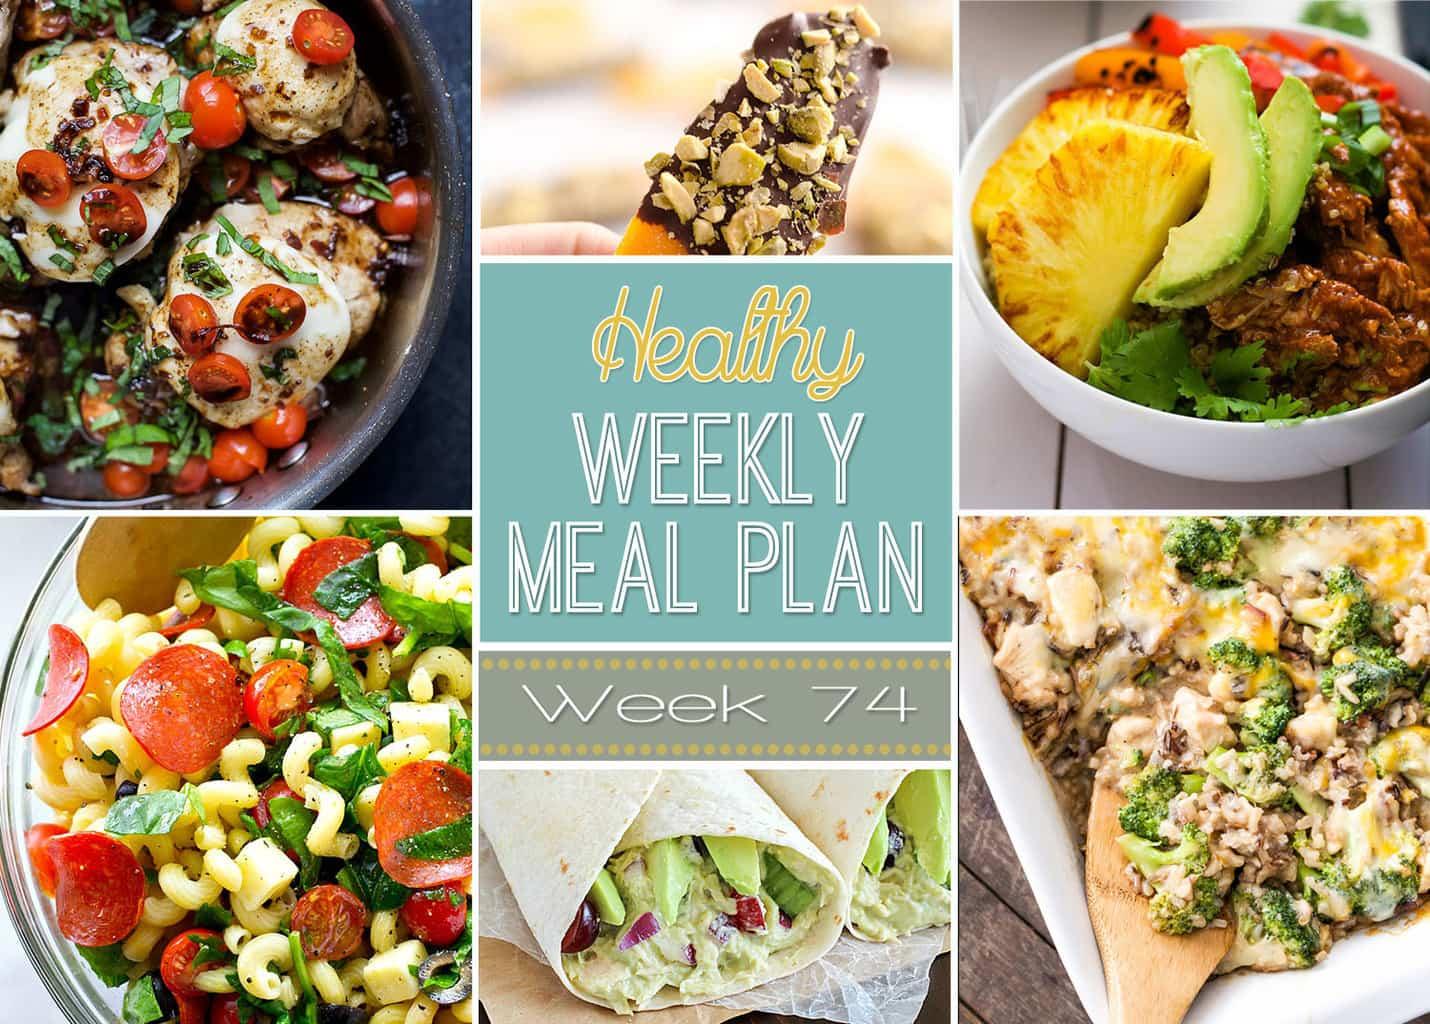 Healthy Weekly Meal Plan 74